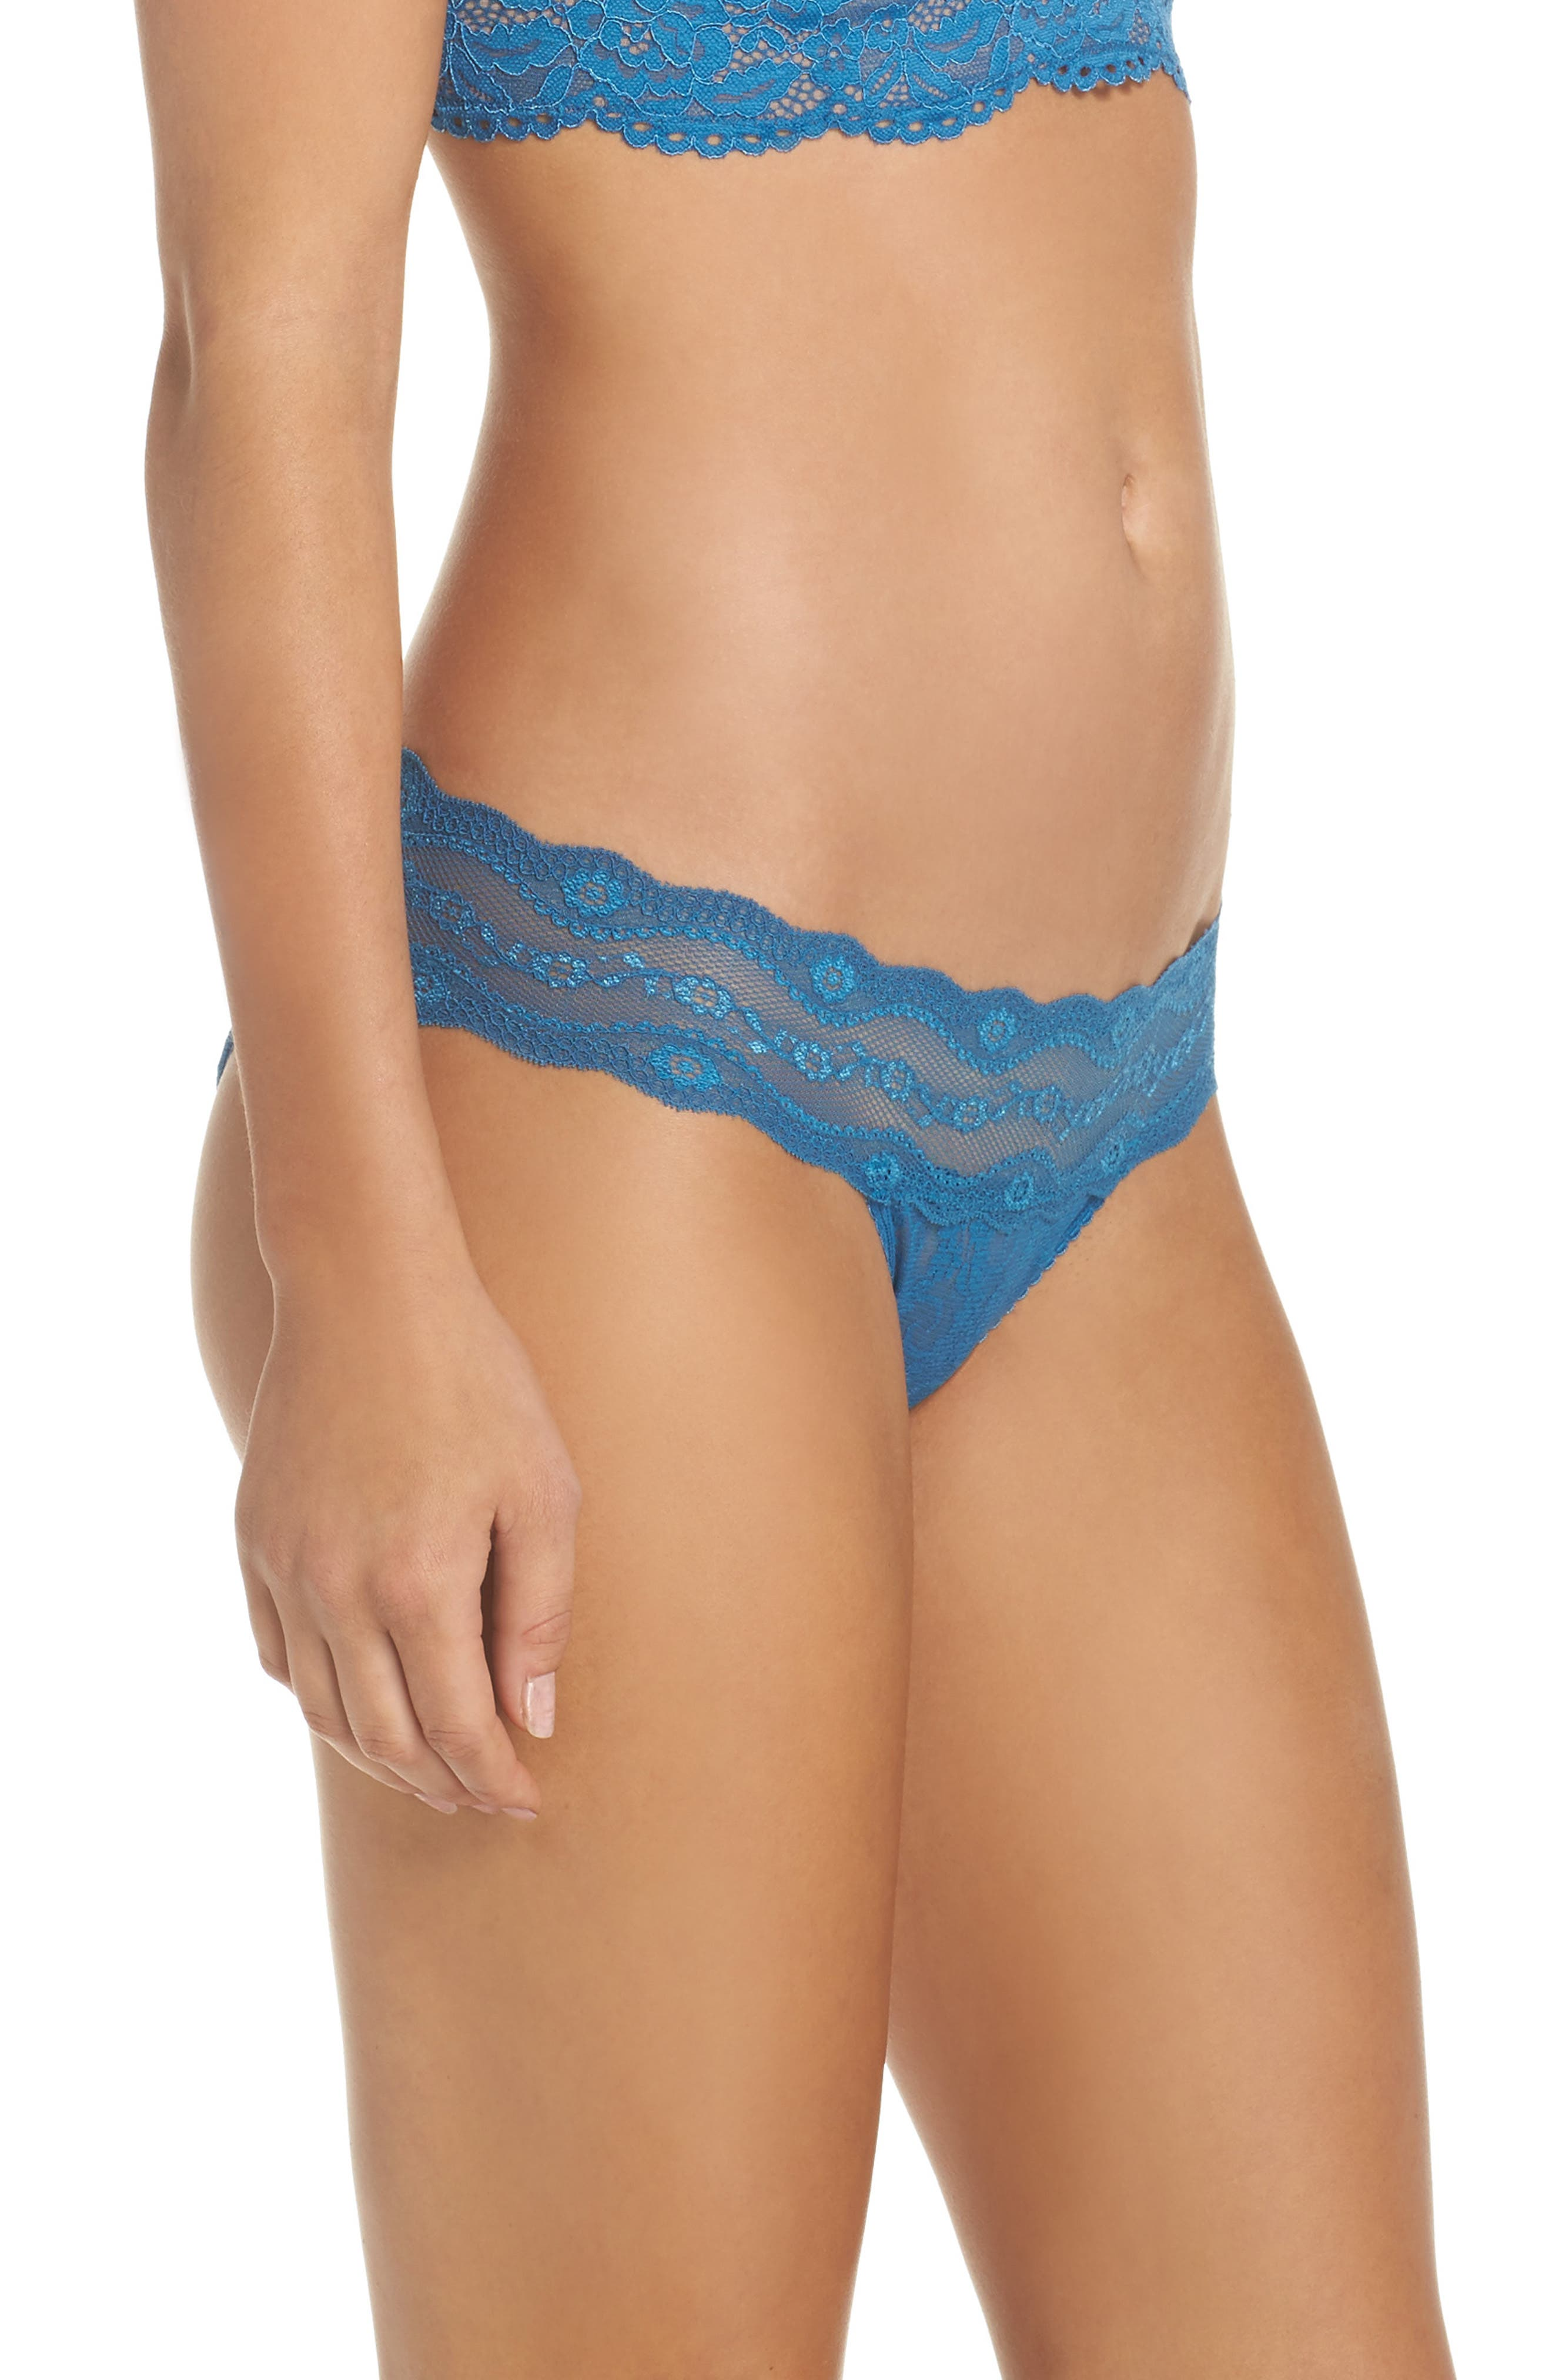 Alternate Image 3  - b.tempt'd by Wacoal 'Lace Kiss' Bikini (3 for $33)